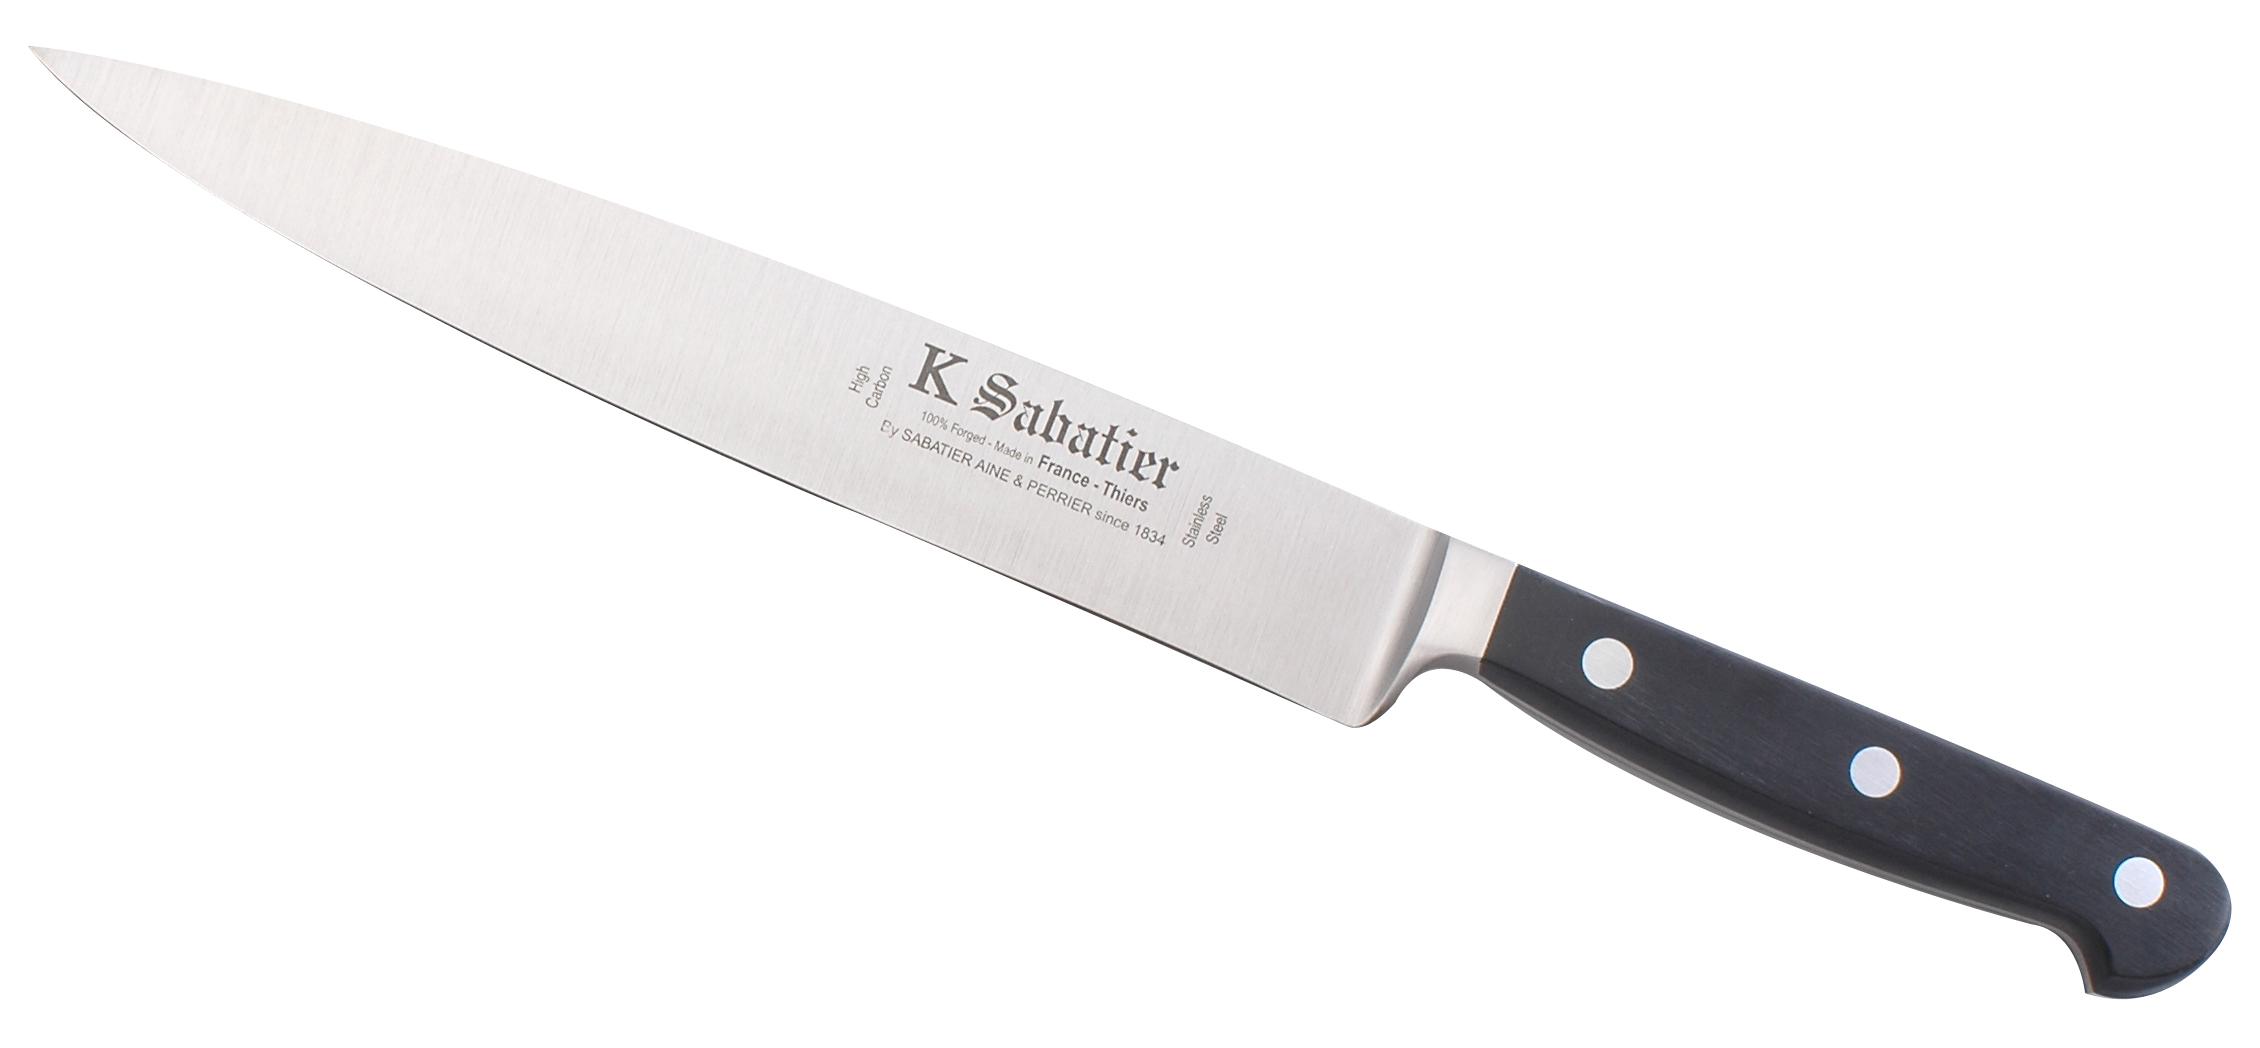 Knives Proxus The Carving Set 5 Knives Chef Sets